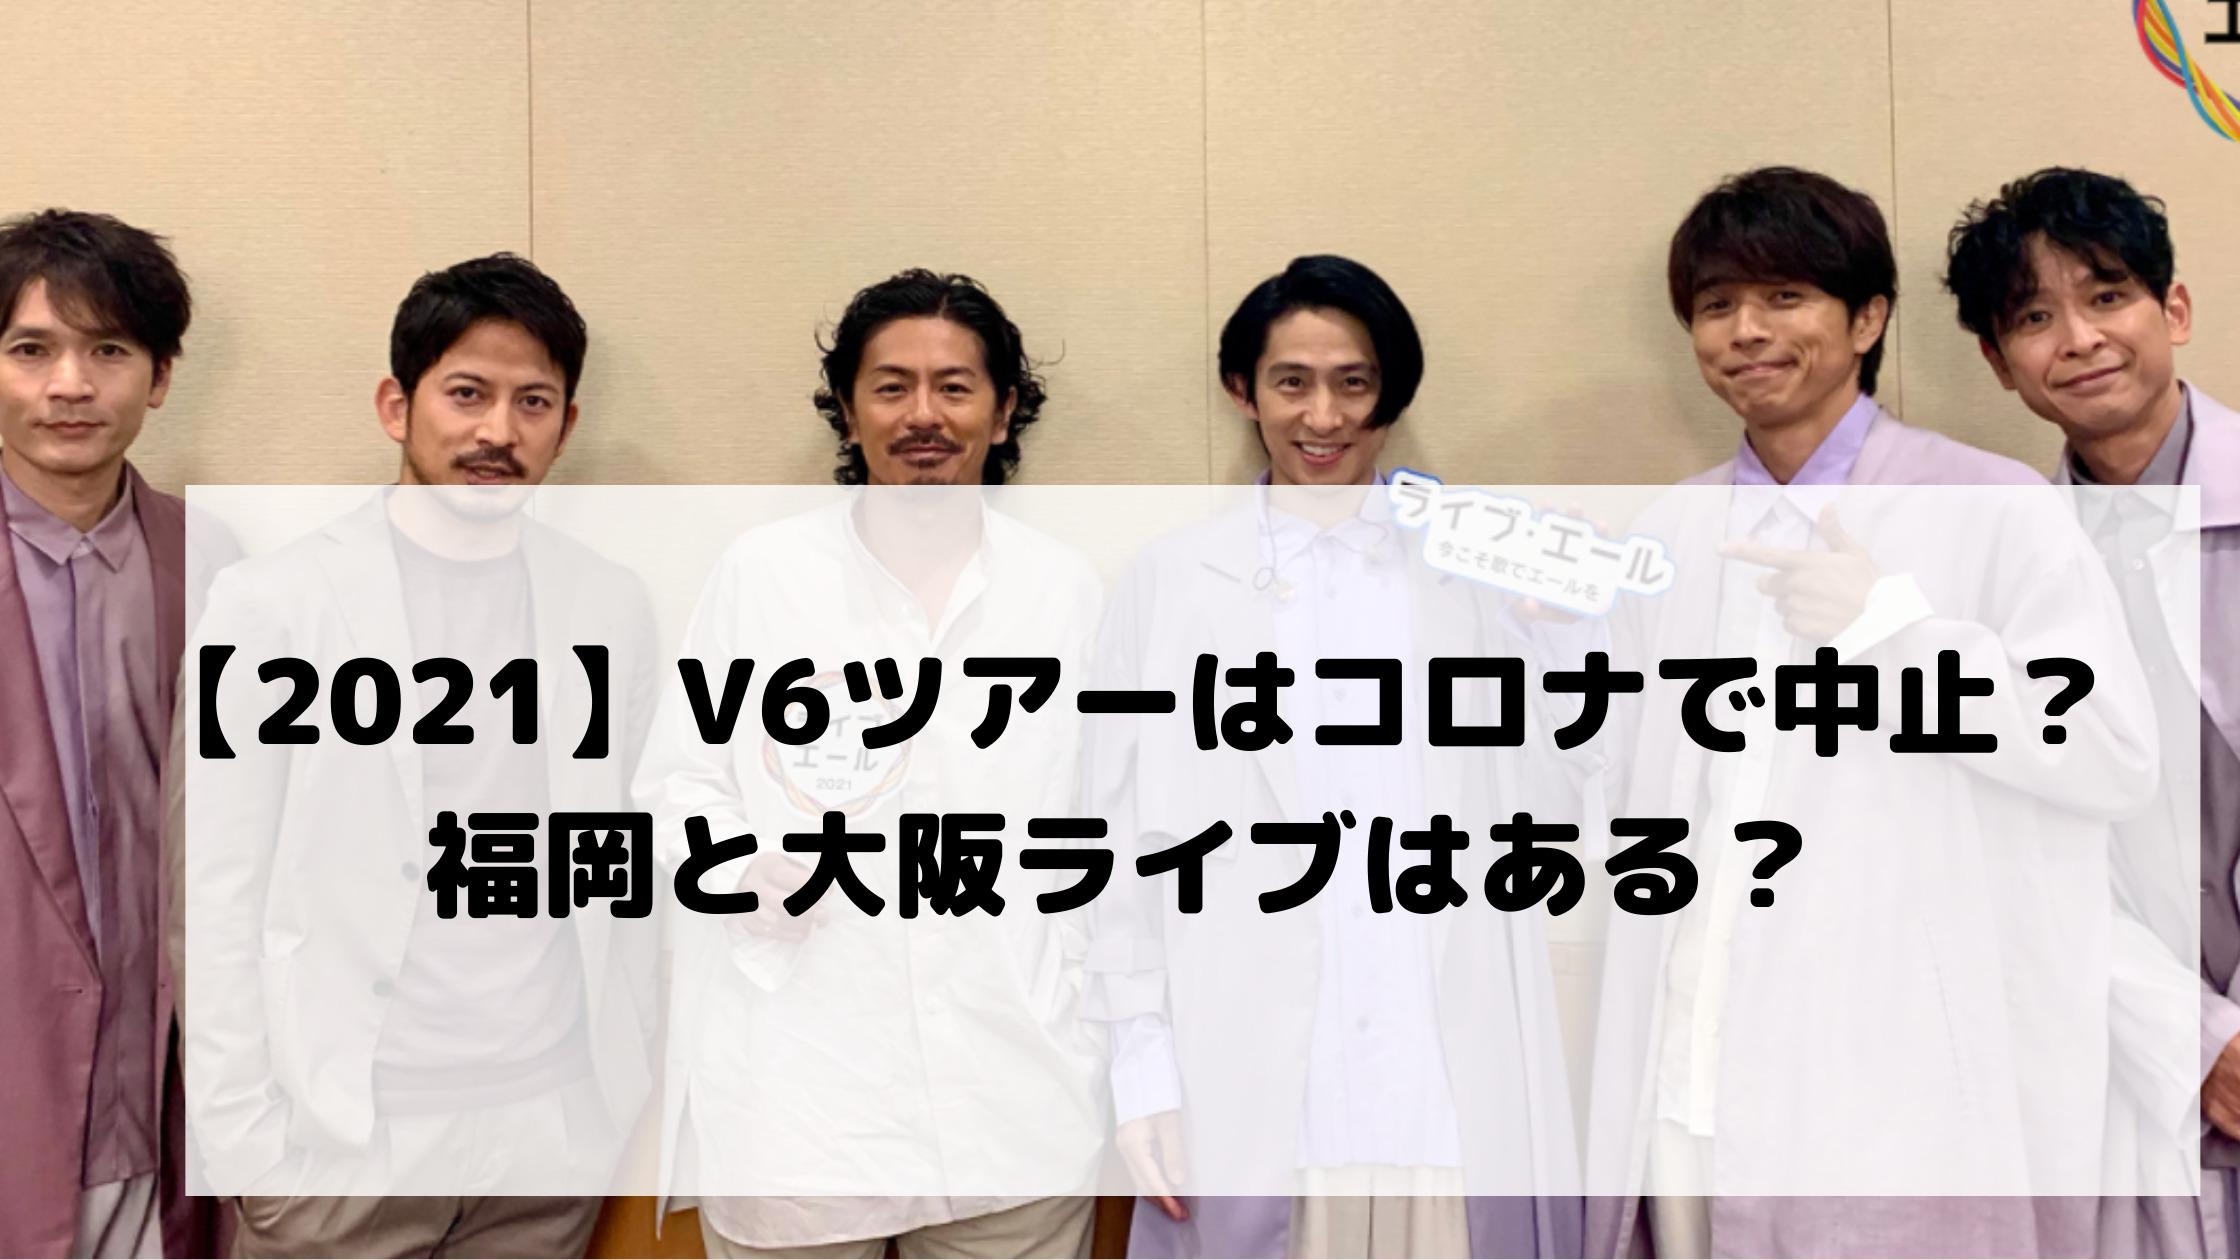 【2021】V6ツアーはコロナで中止?福岡と大阪ライブはある?